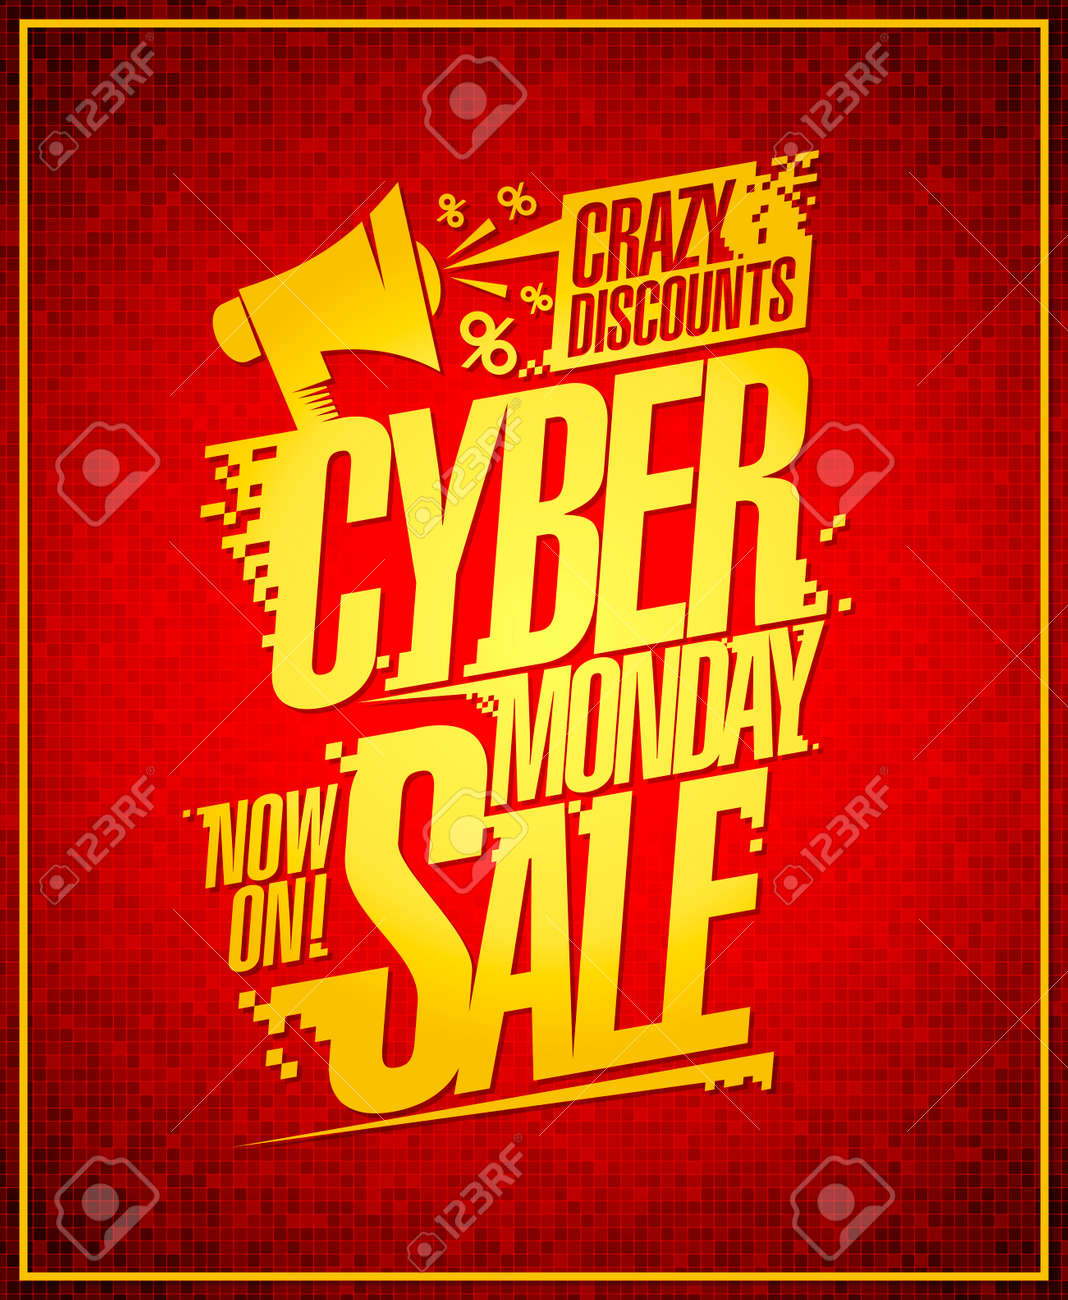 4230f19d785 Cyber Monday crazy discounts sale banner.